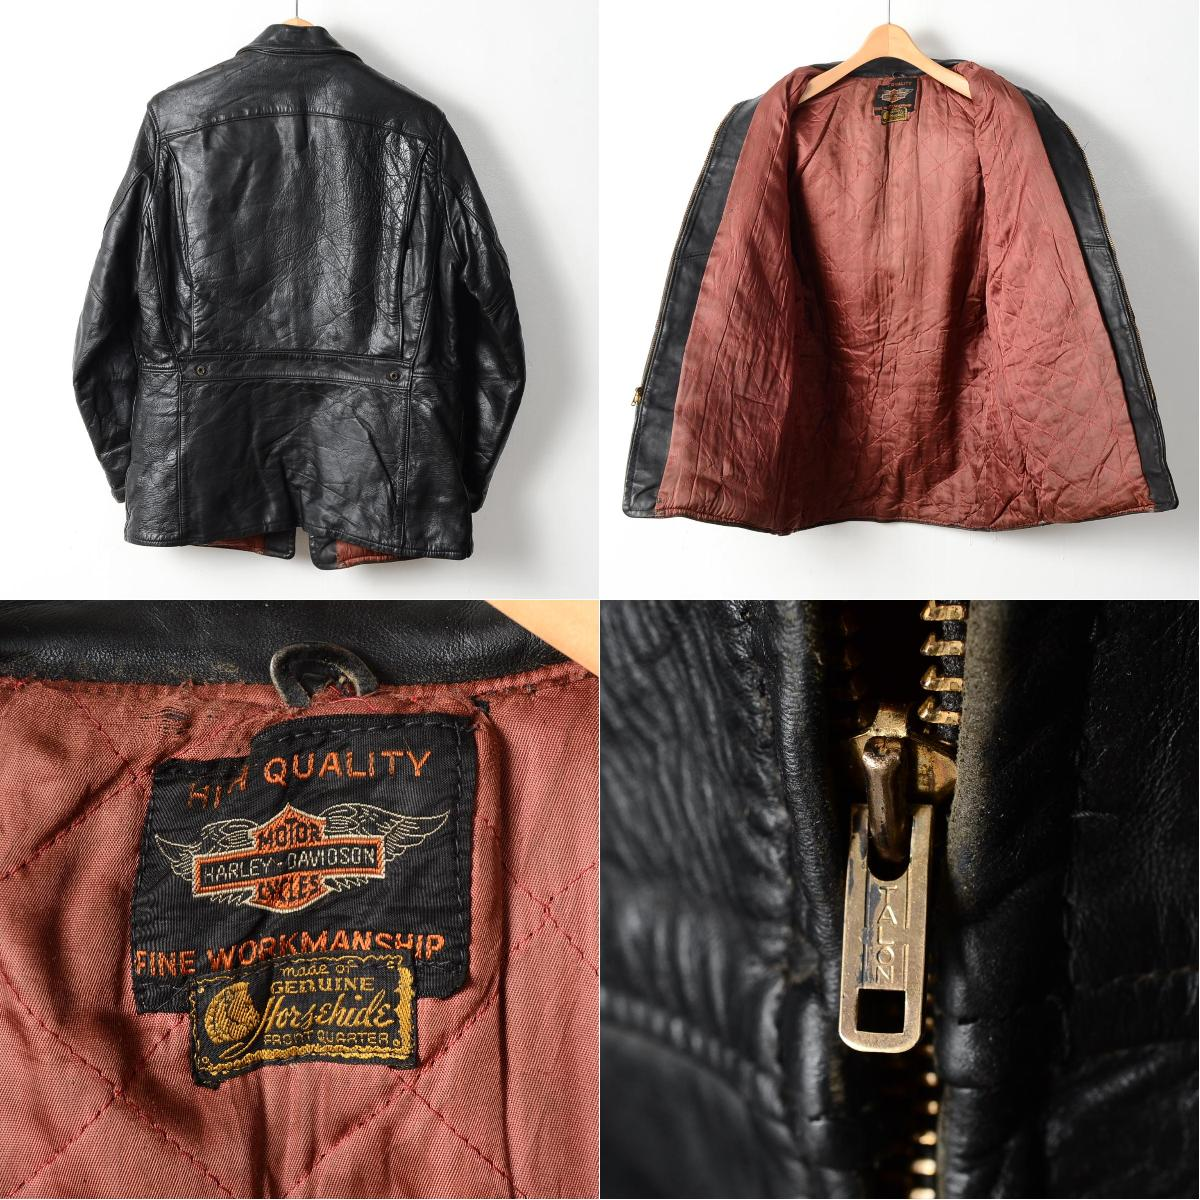 利亚 ! 50 年代 Harley Davidson 老乡老乡美国取得双射线夹克男装 S 老式 Harley Davidson /wed4061 140925。